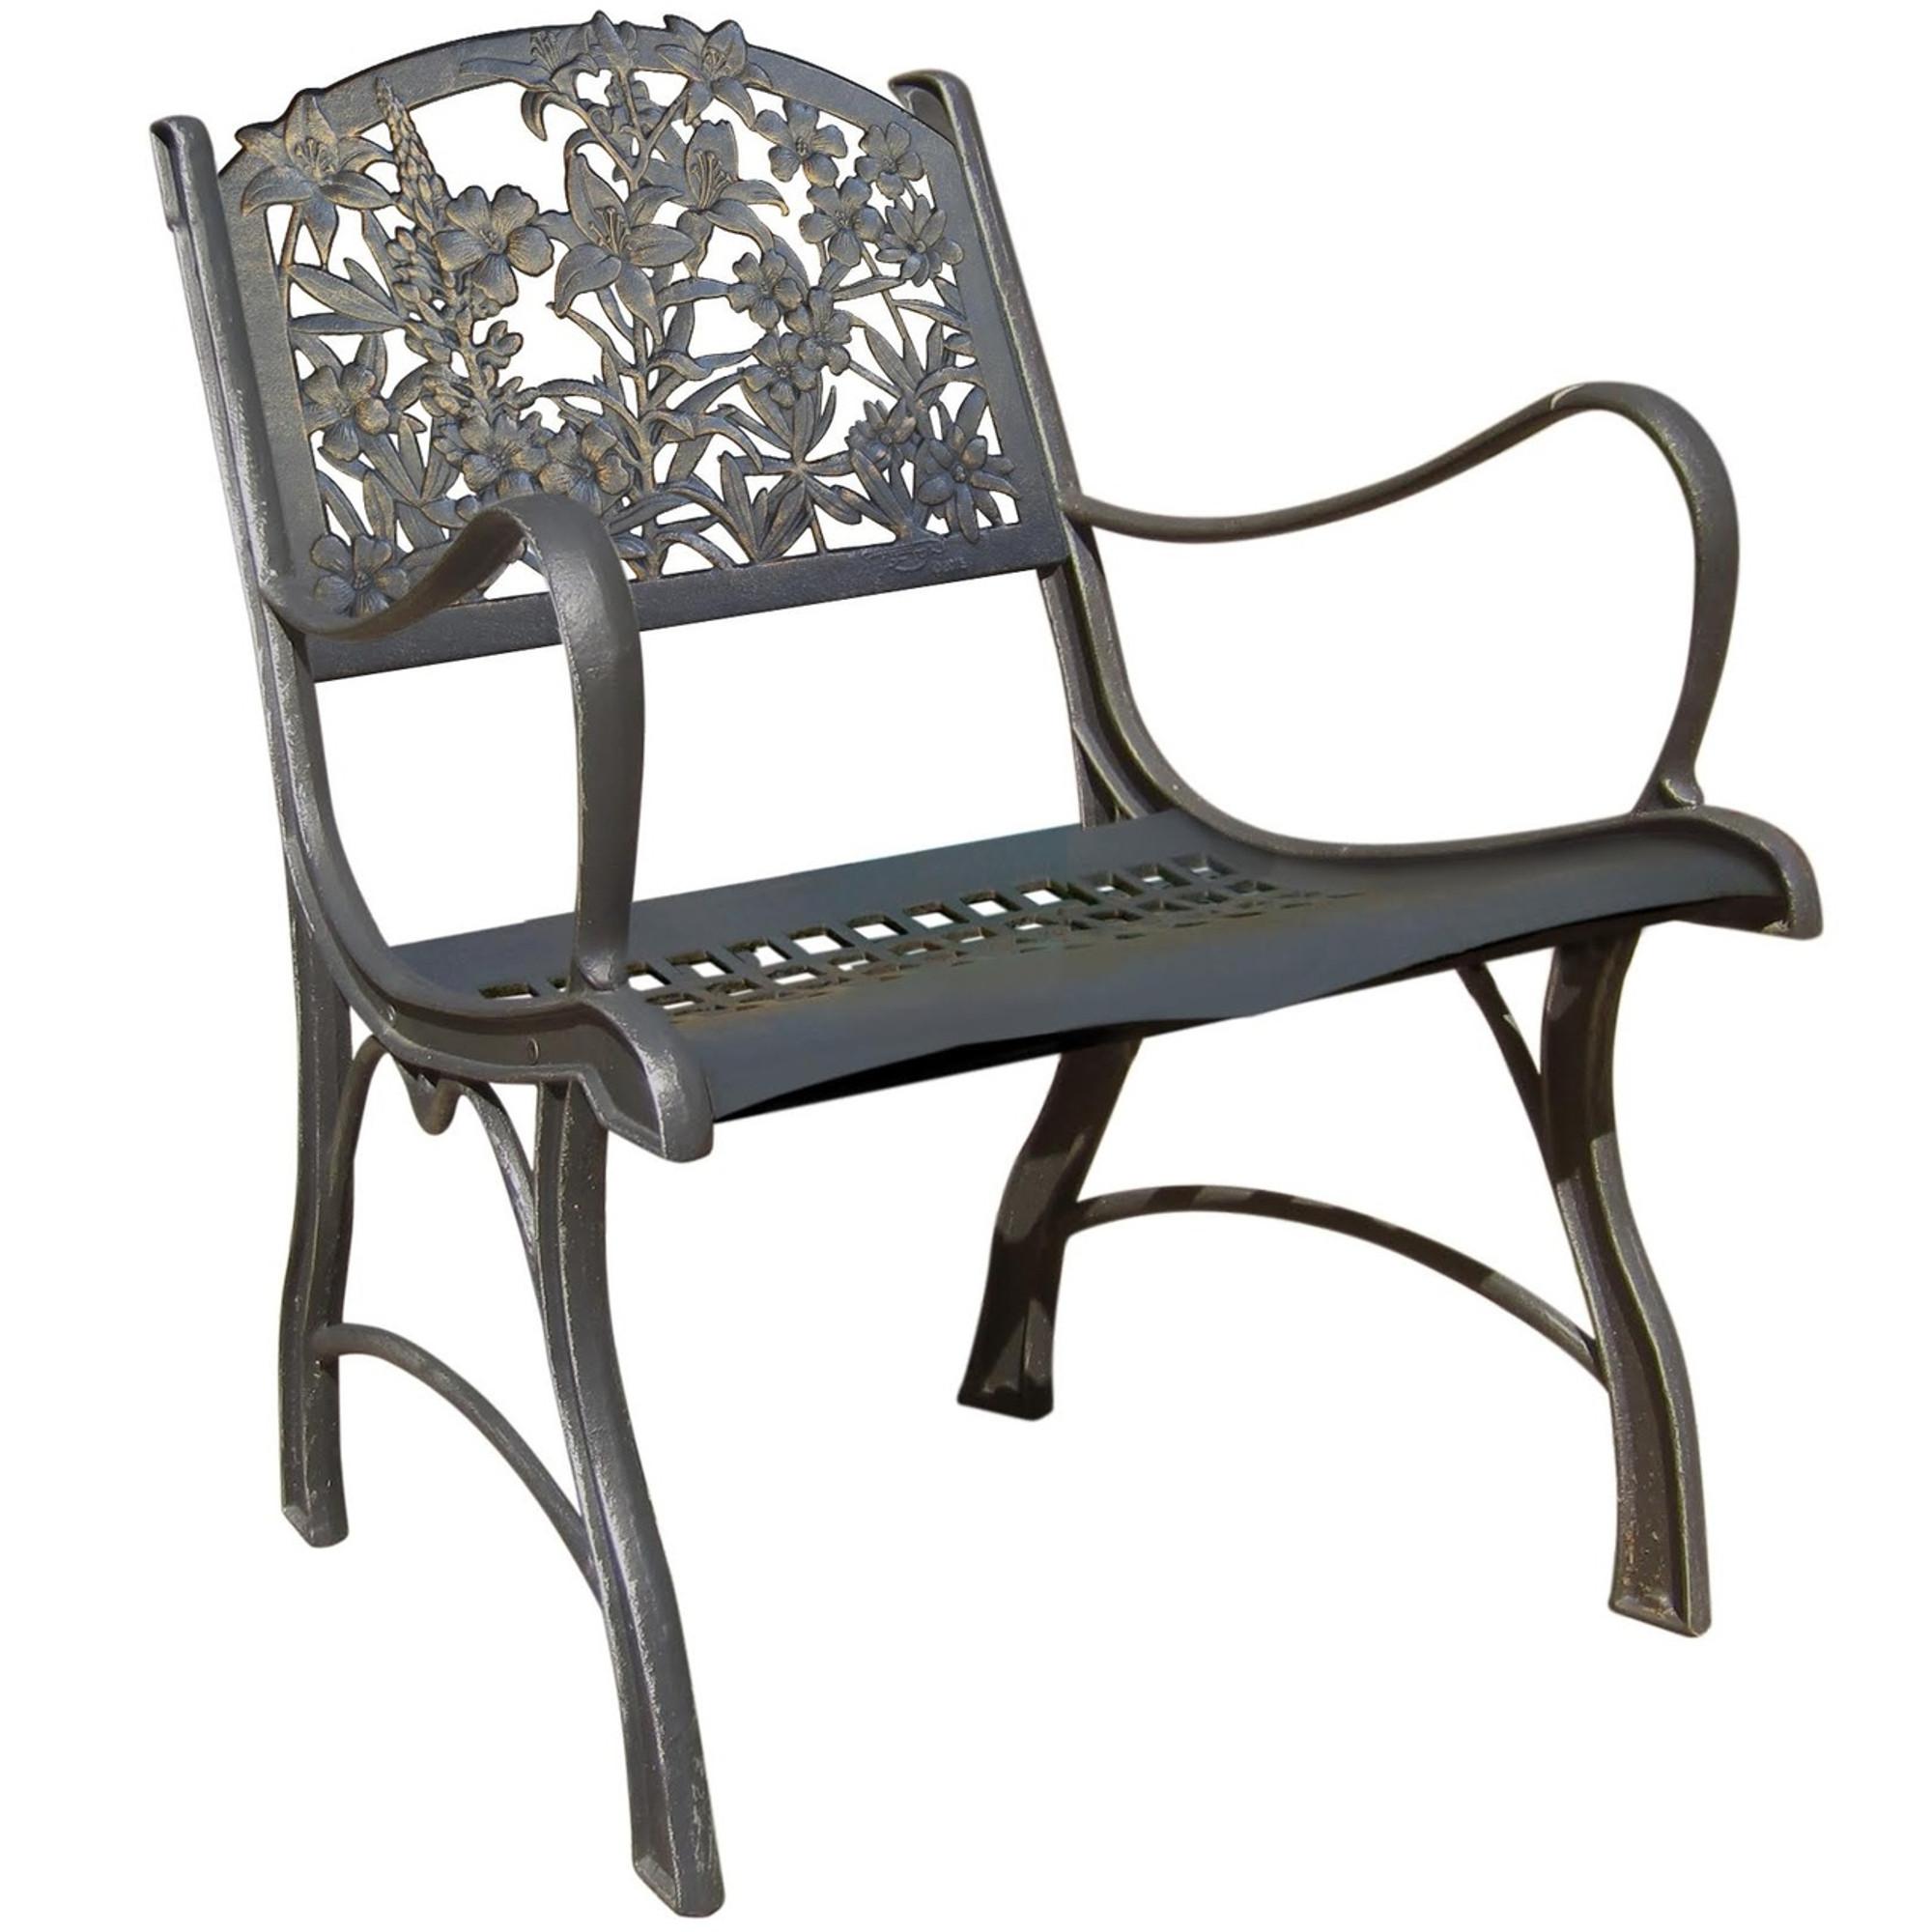 Astonishing Wildflower Cast Iron Chair Andrewgaddart Wooden Chair Designs For Living Room Andrewgaddartcom